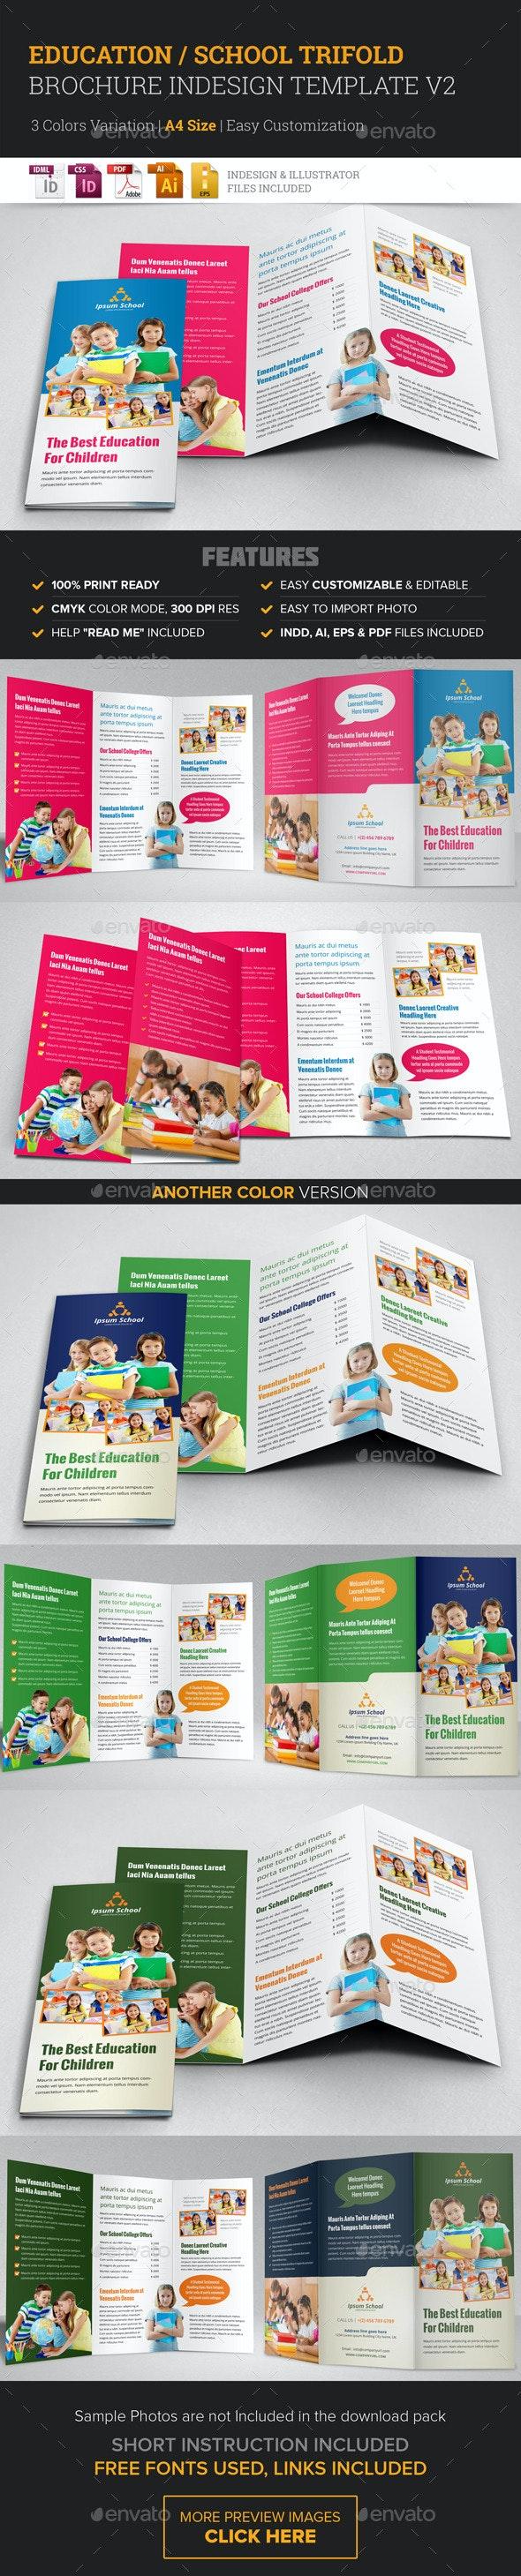 Education School Trifold Brochure Template v2  - Corporate Brochures